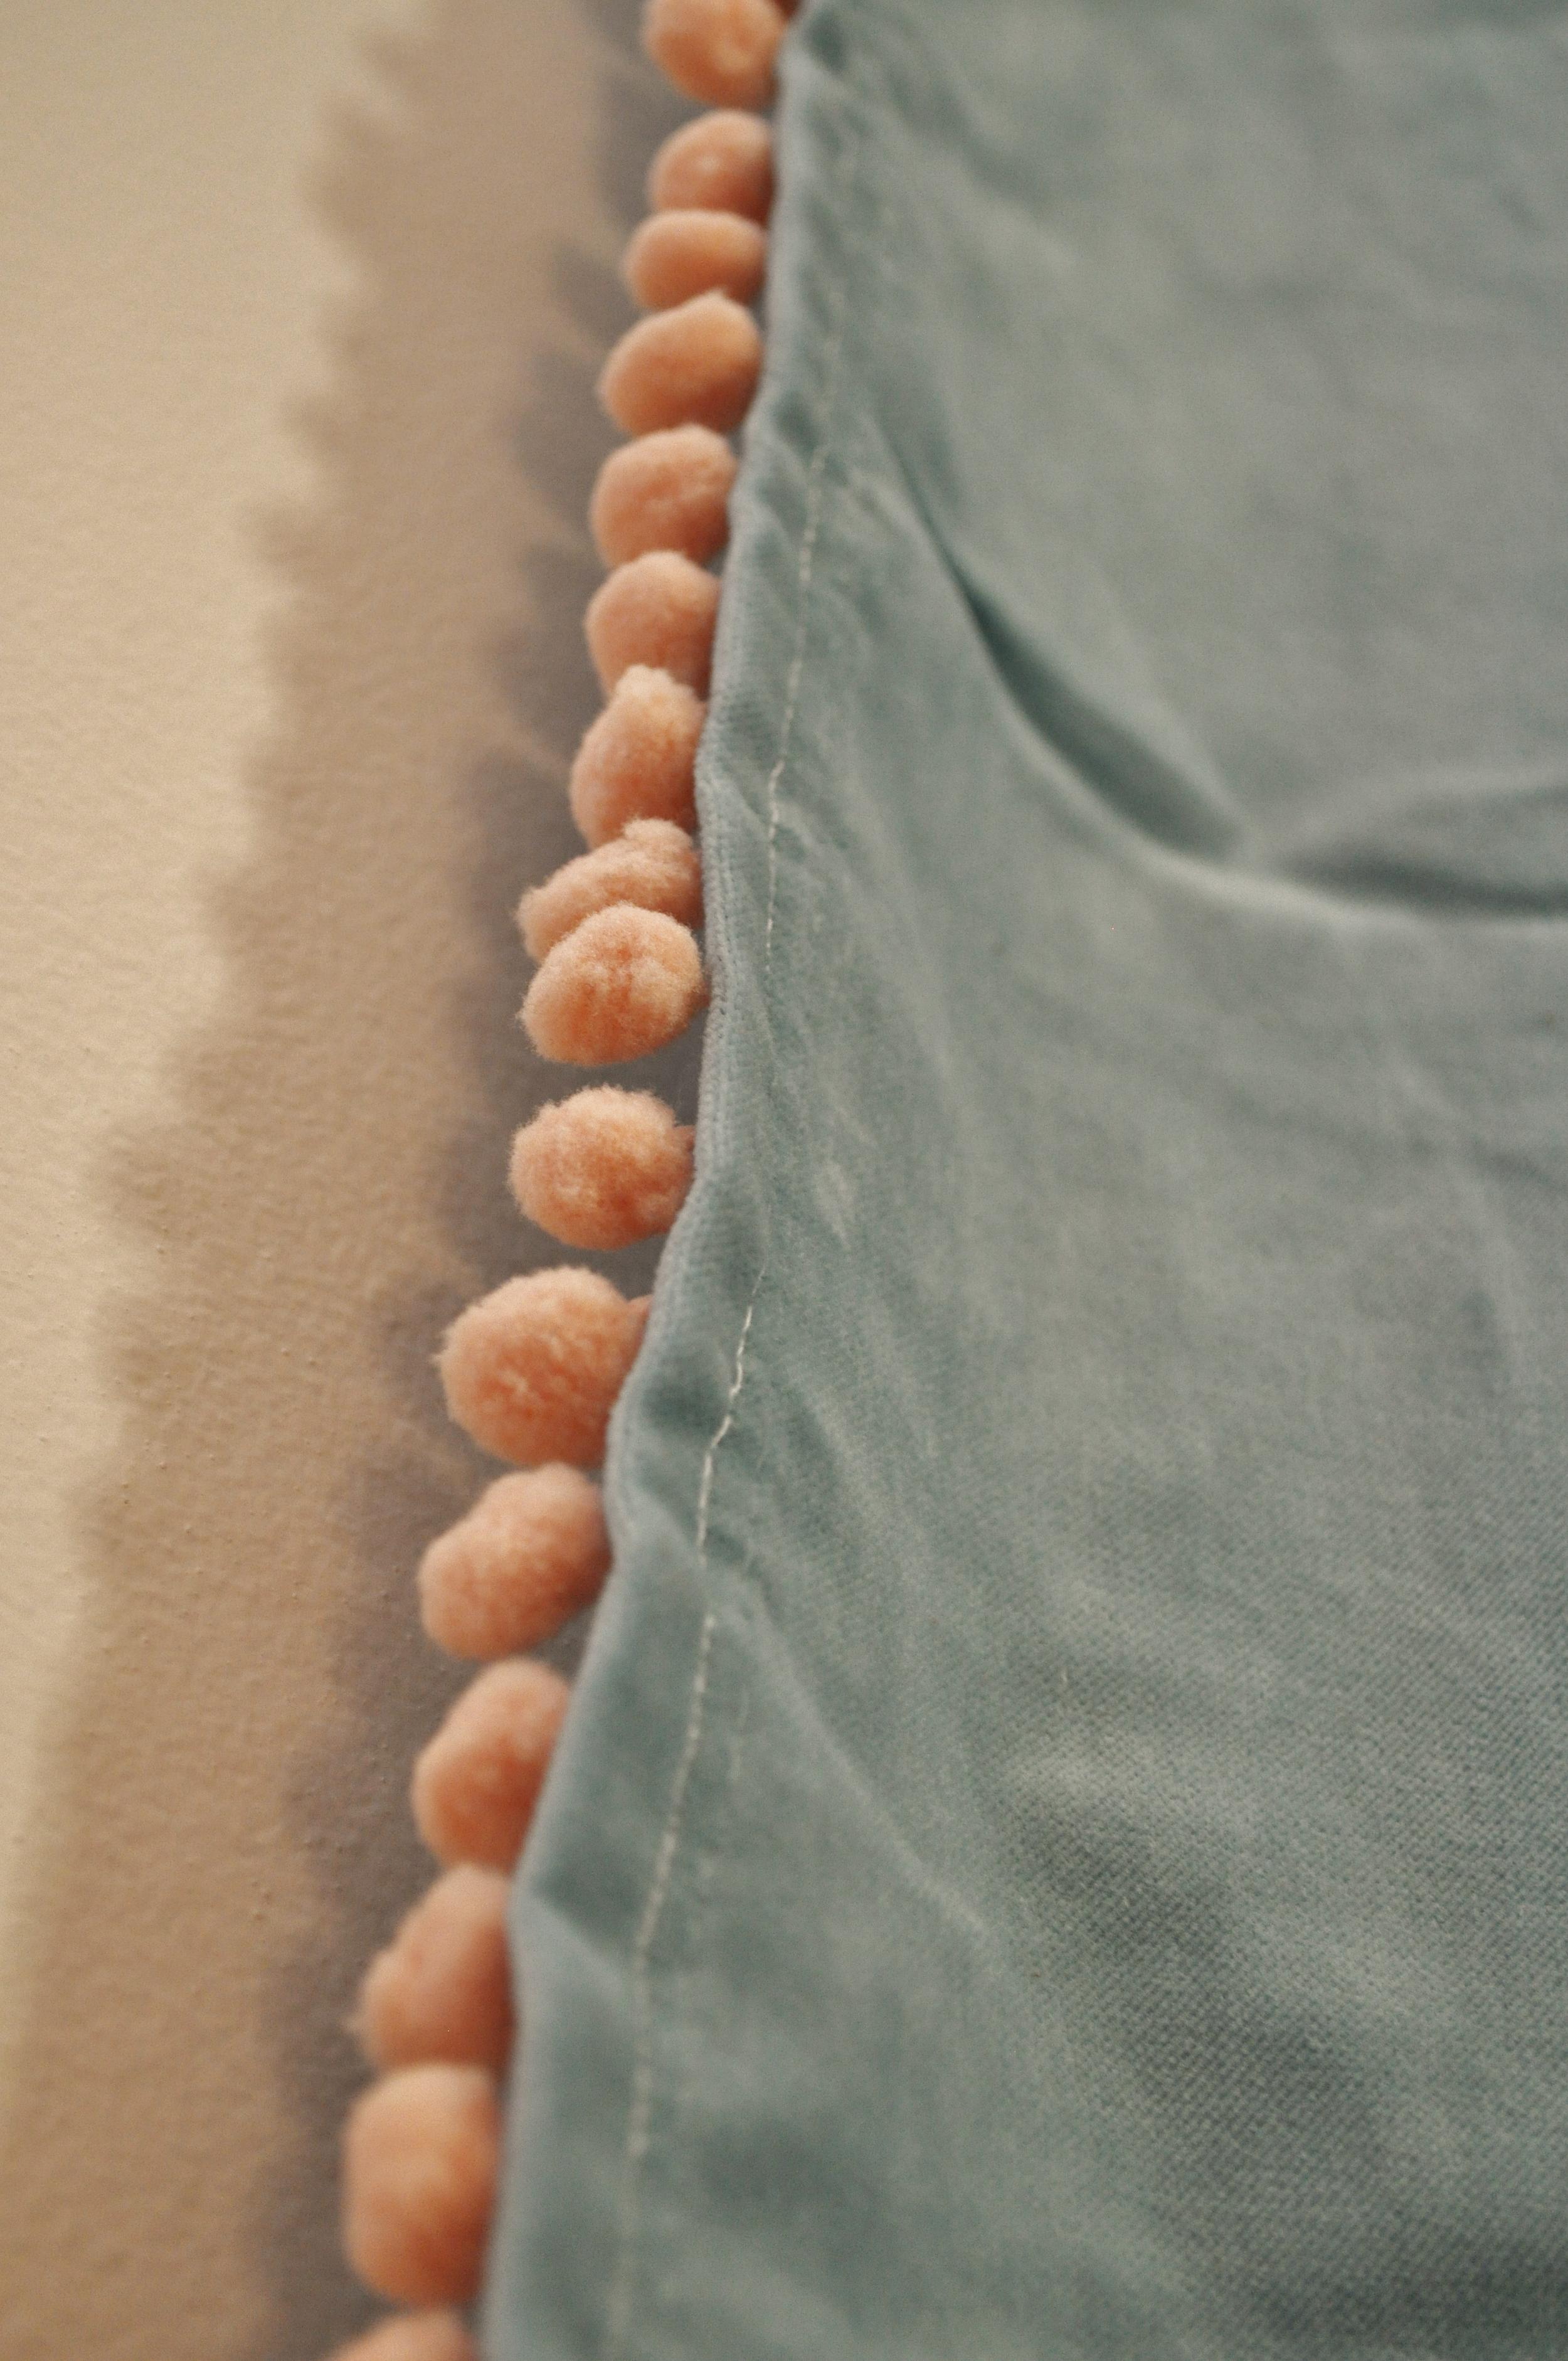 pompom trim sewed on